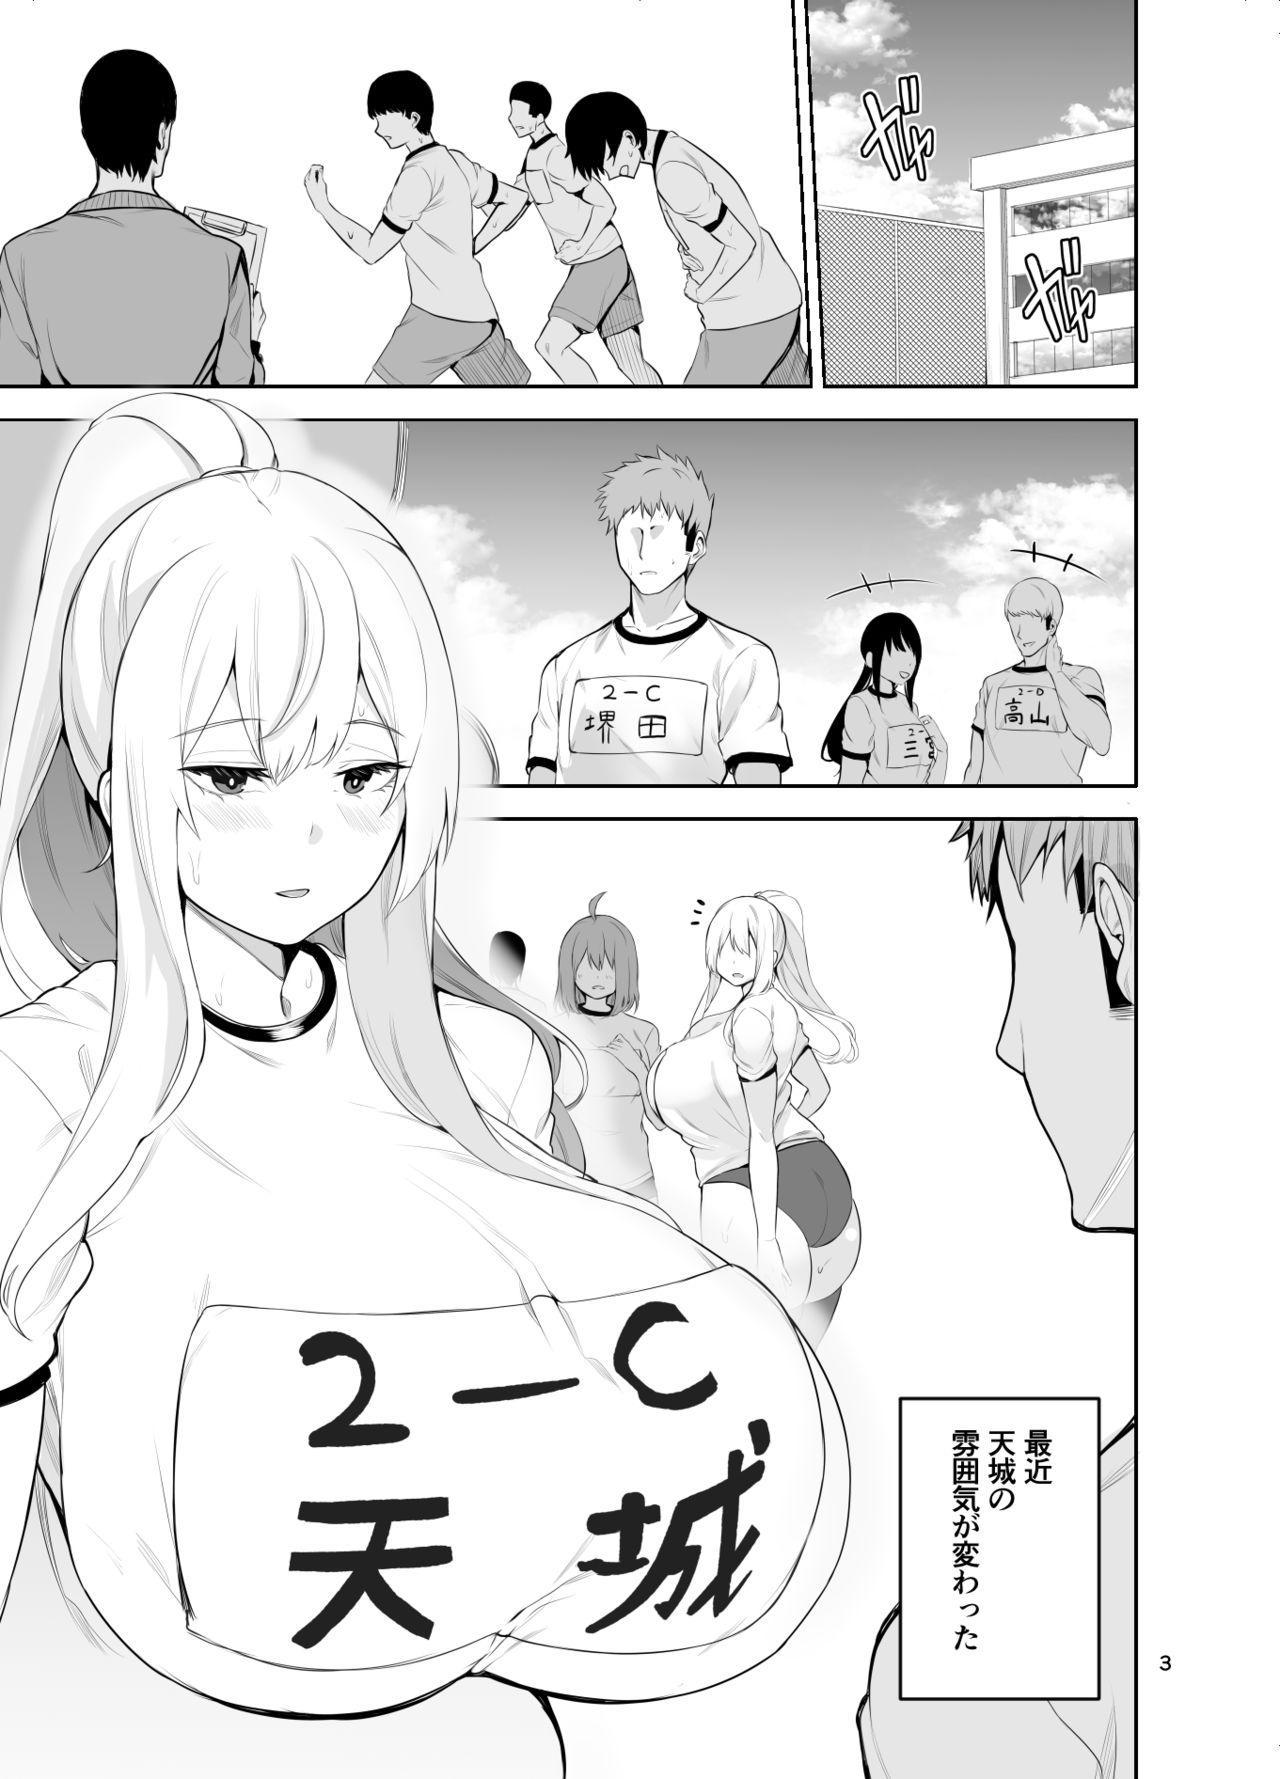 [Wakuseiburo (cup-chan)] TS Musume Kodama-chan to H! Sono 4 | TS Girl Kodama-chan and Ecchi! Part 4 [Digital] 3